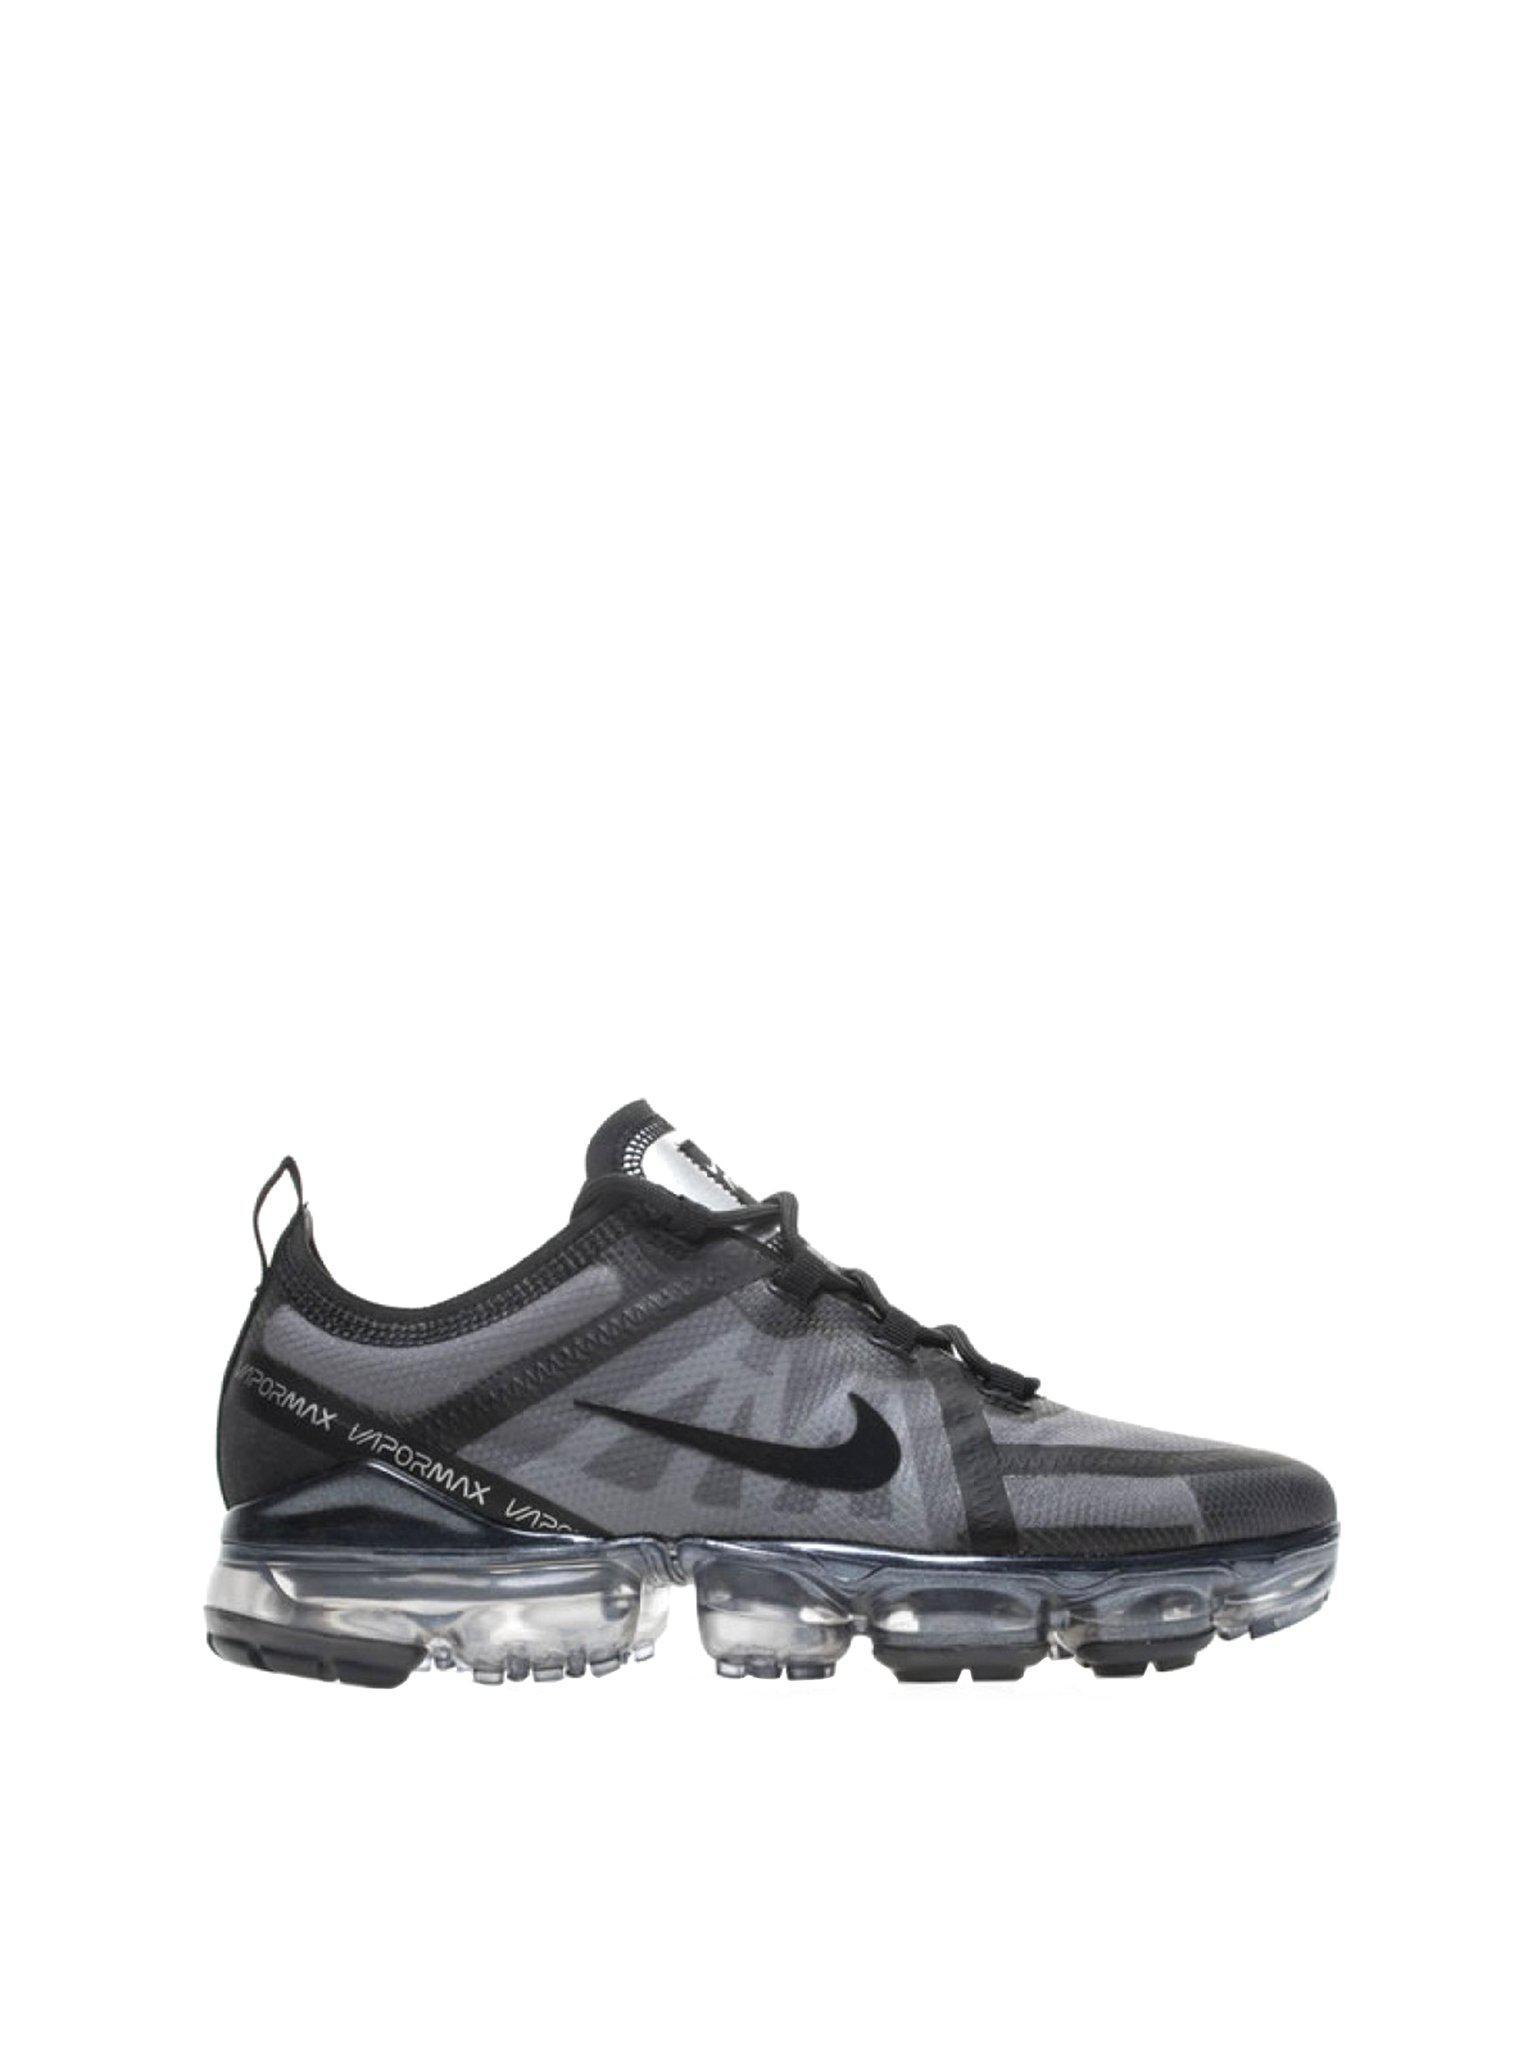 a4d169a93cdf5f Nike Air Vapormax 2019 in Black for Men - Lyst